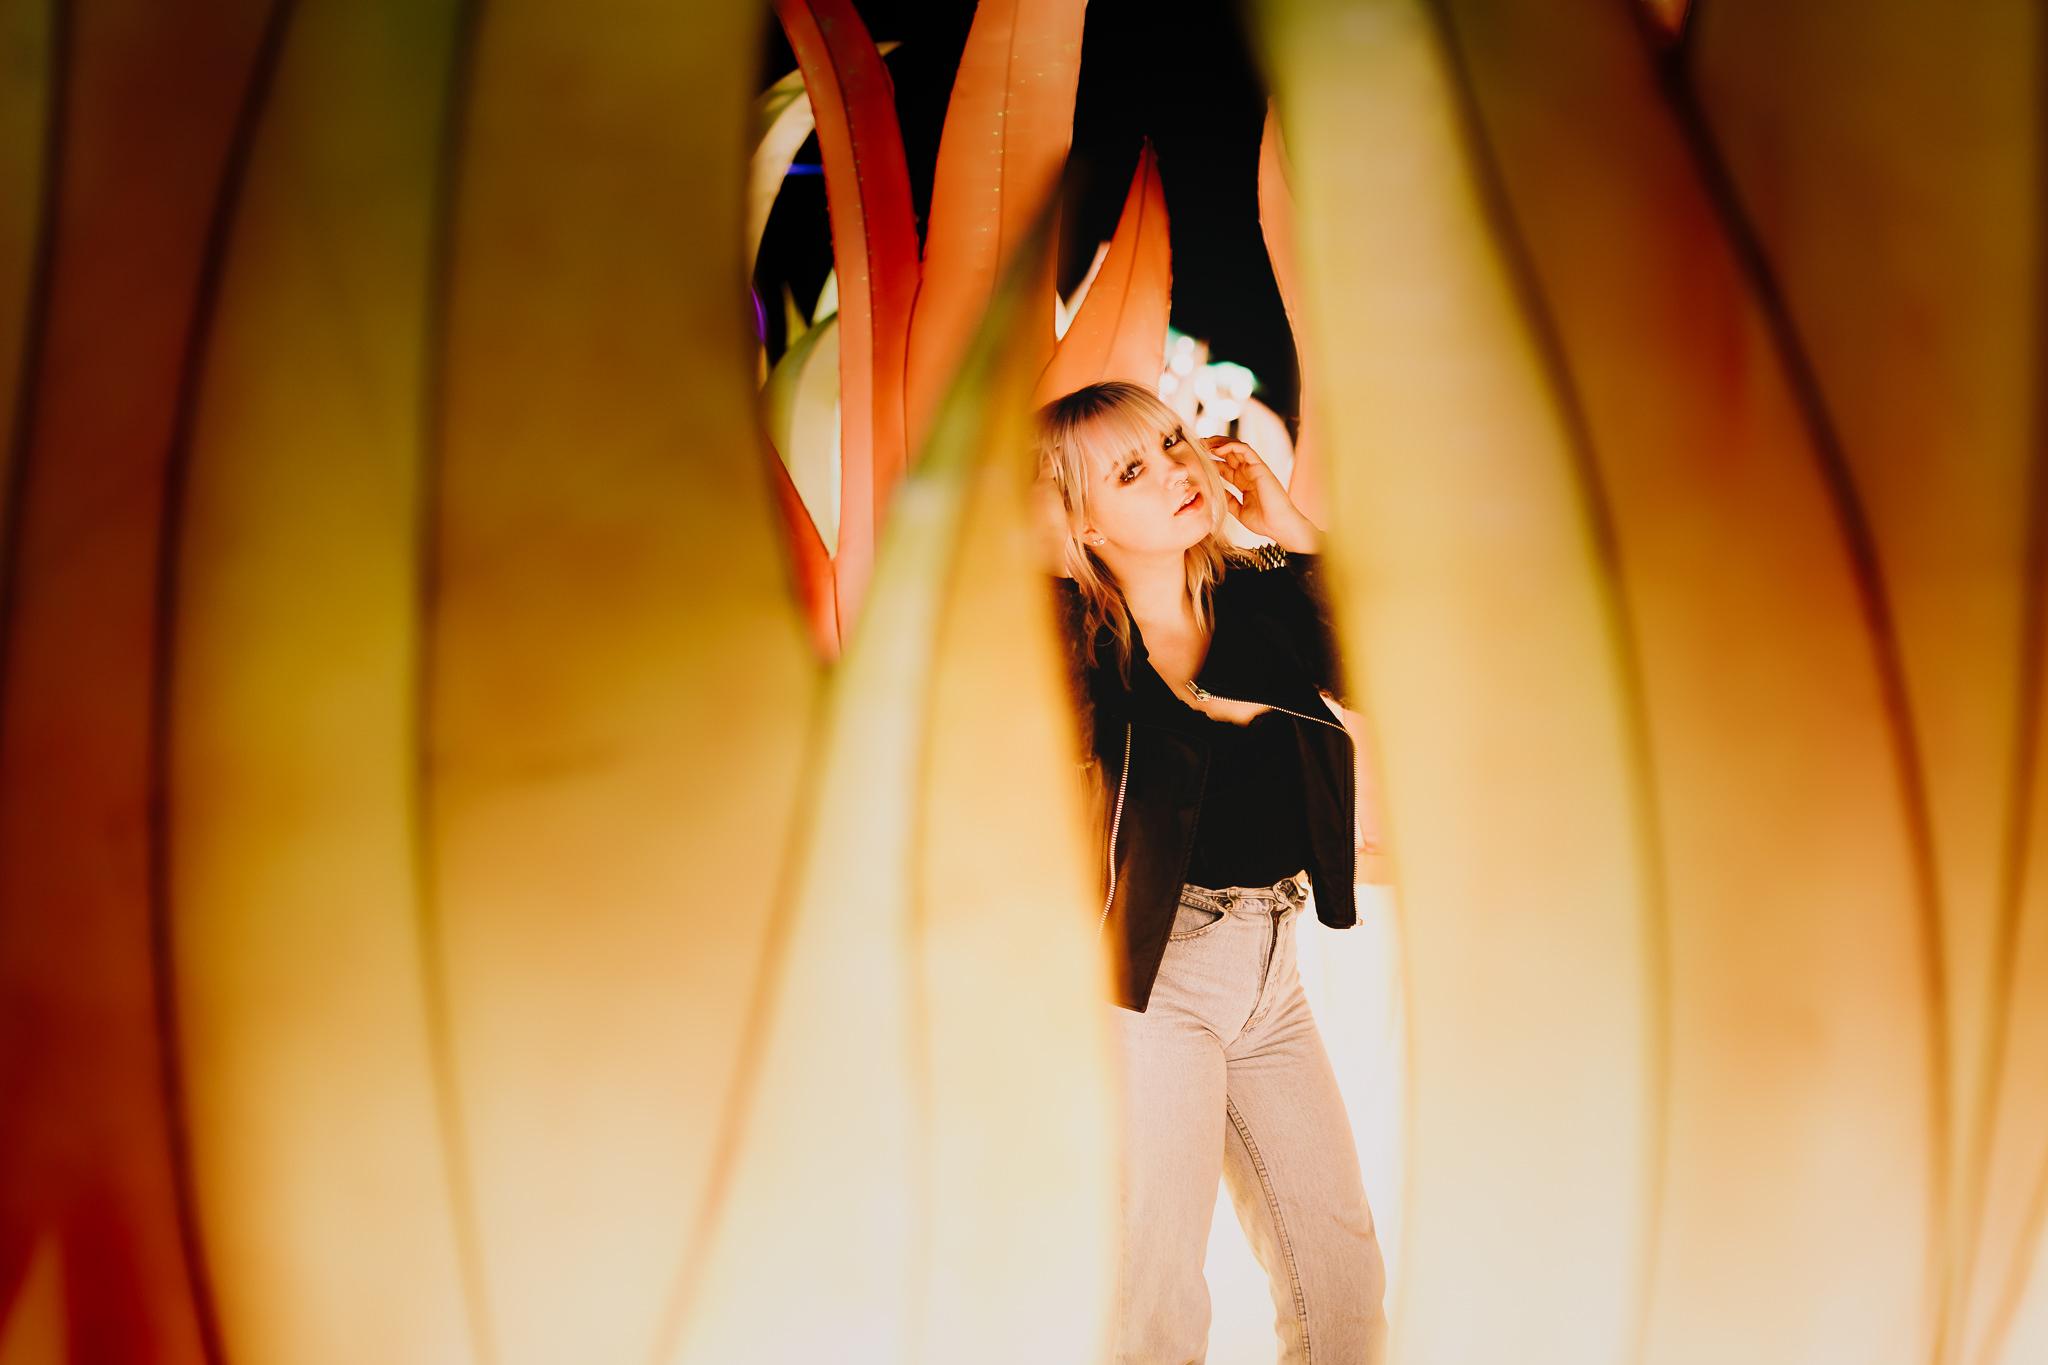 Archer Inspired Photography Sacramento California Wedding Lifestyle Photographer Offbeat Natural Light Documentary-59.jpg